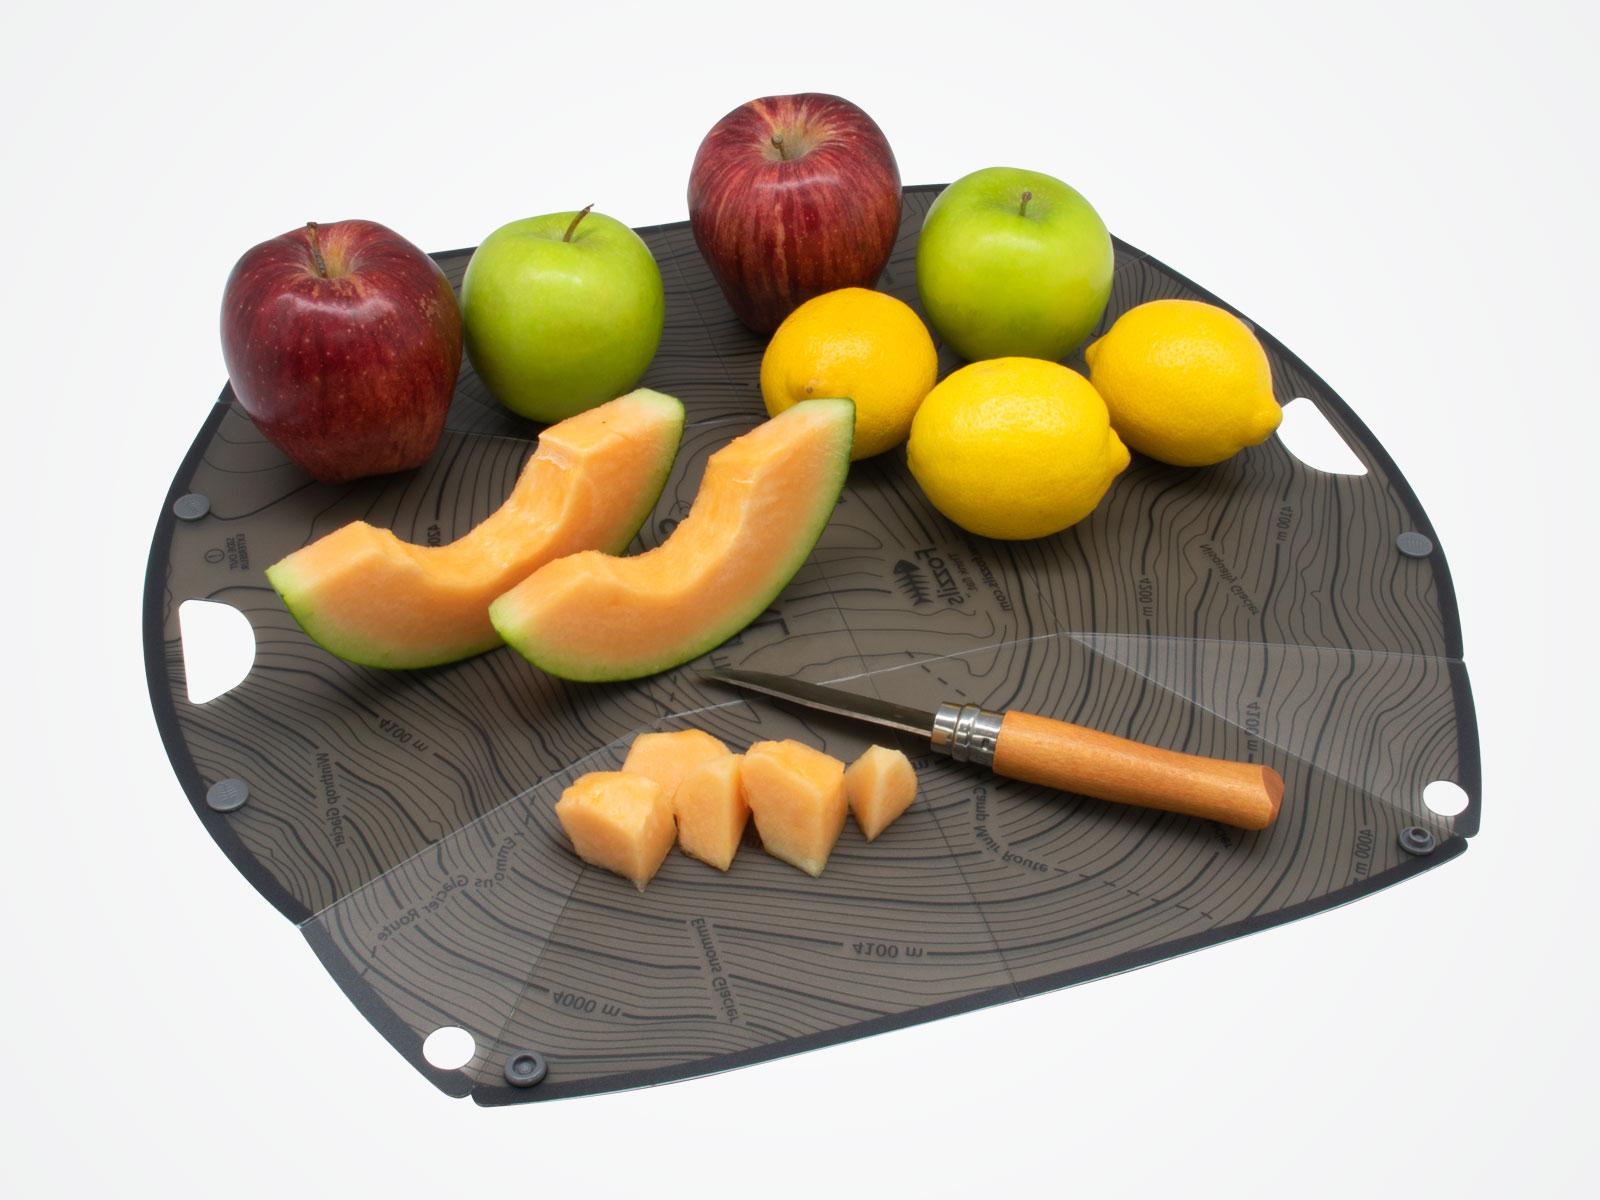 BowlXL - Cutting board